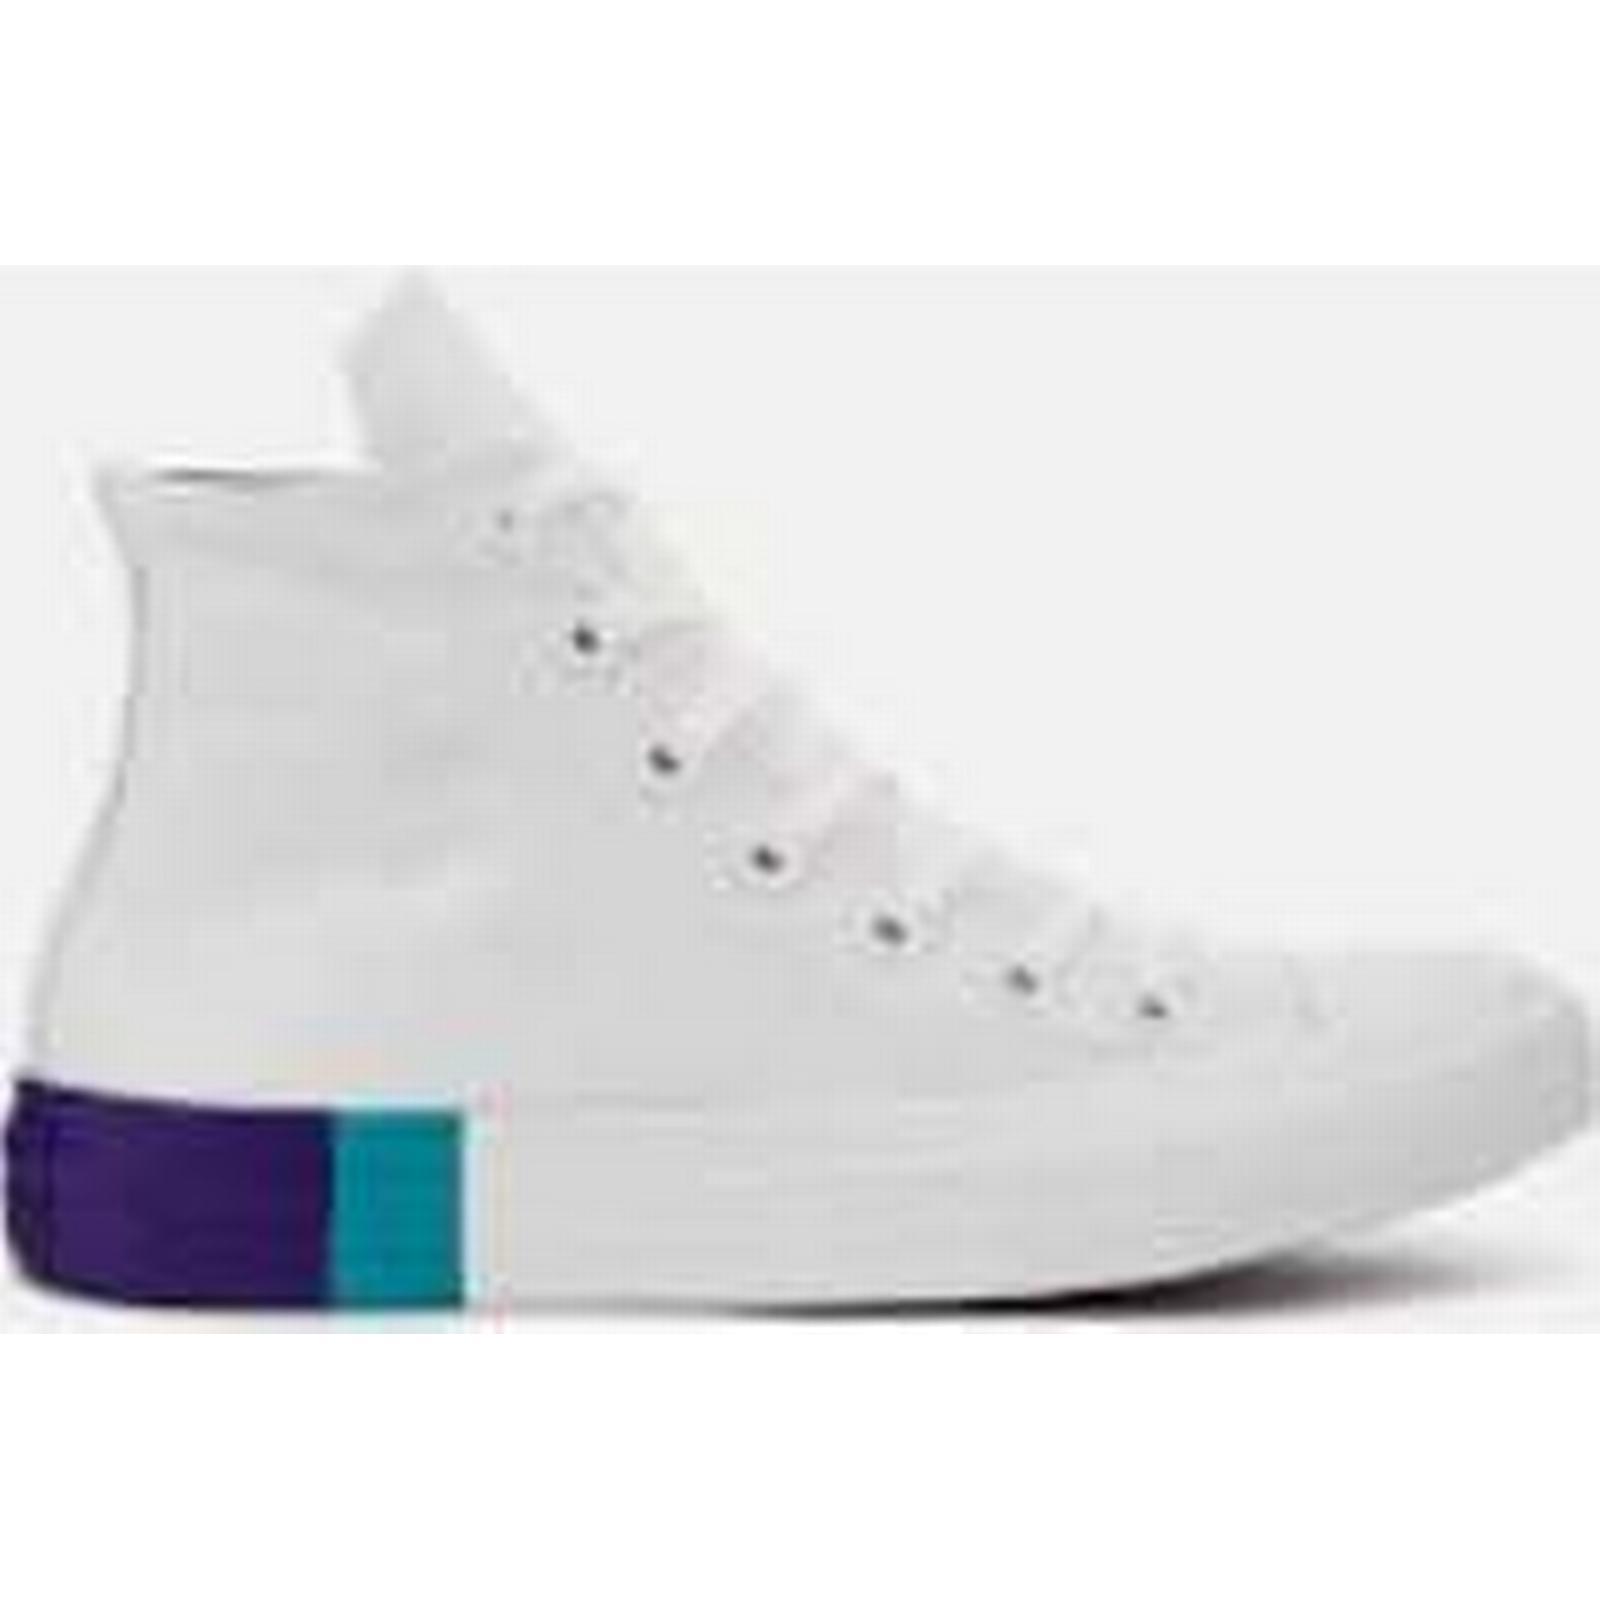 Converse Women's Chuck Taylor All Star Hi-Top Trainers - - White/Enamel Aqua/Court Purple - Trainers UK 6 - White 24ce99